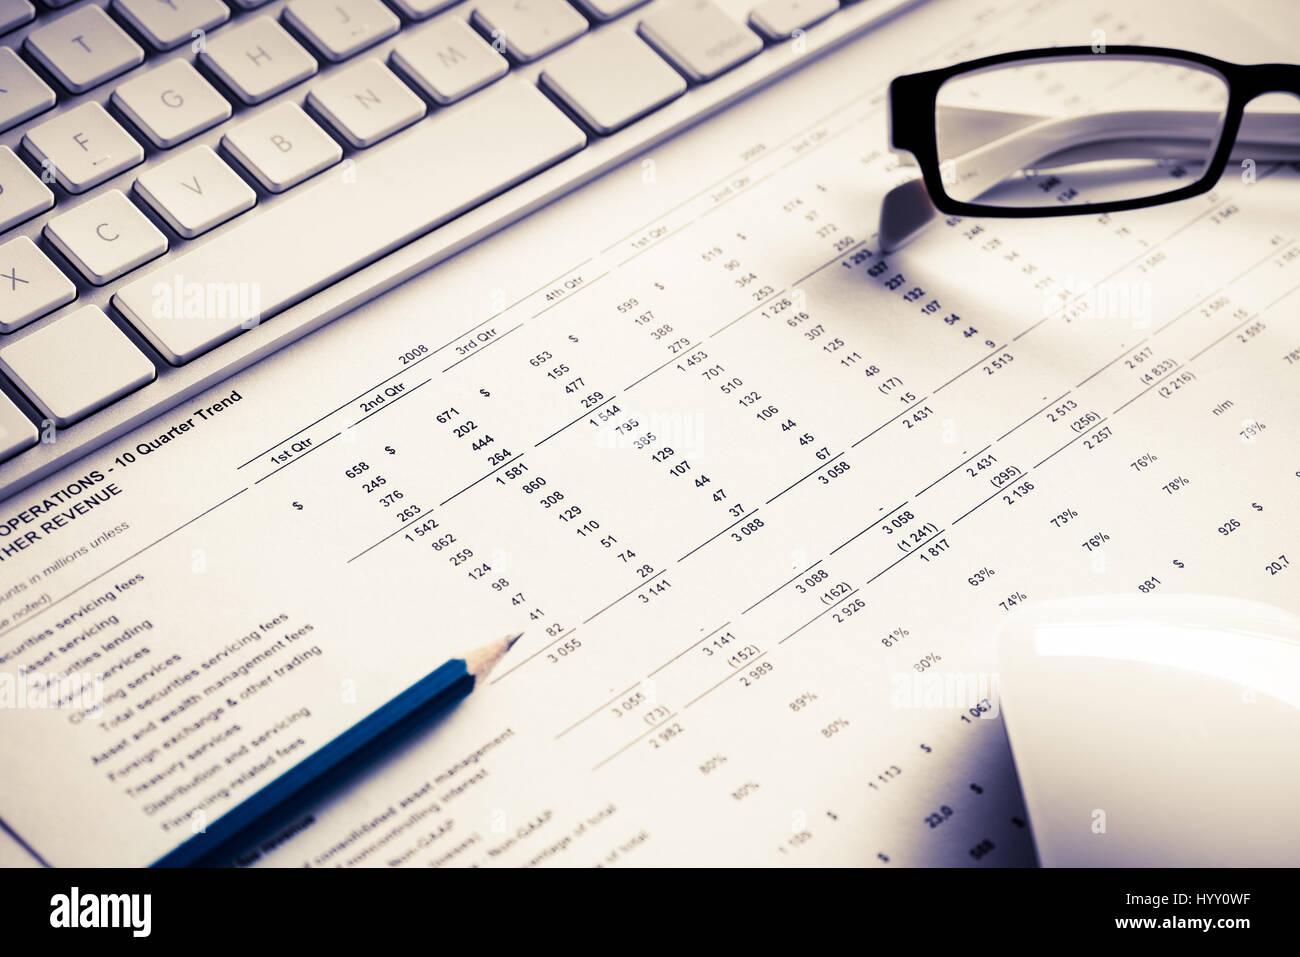 Preparing average sales report - Stock Image